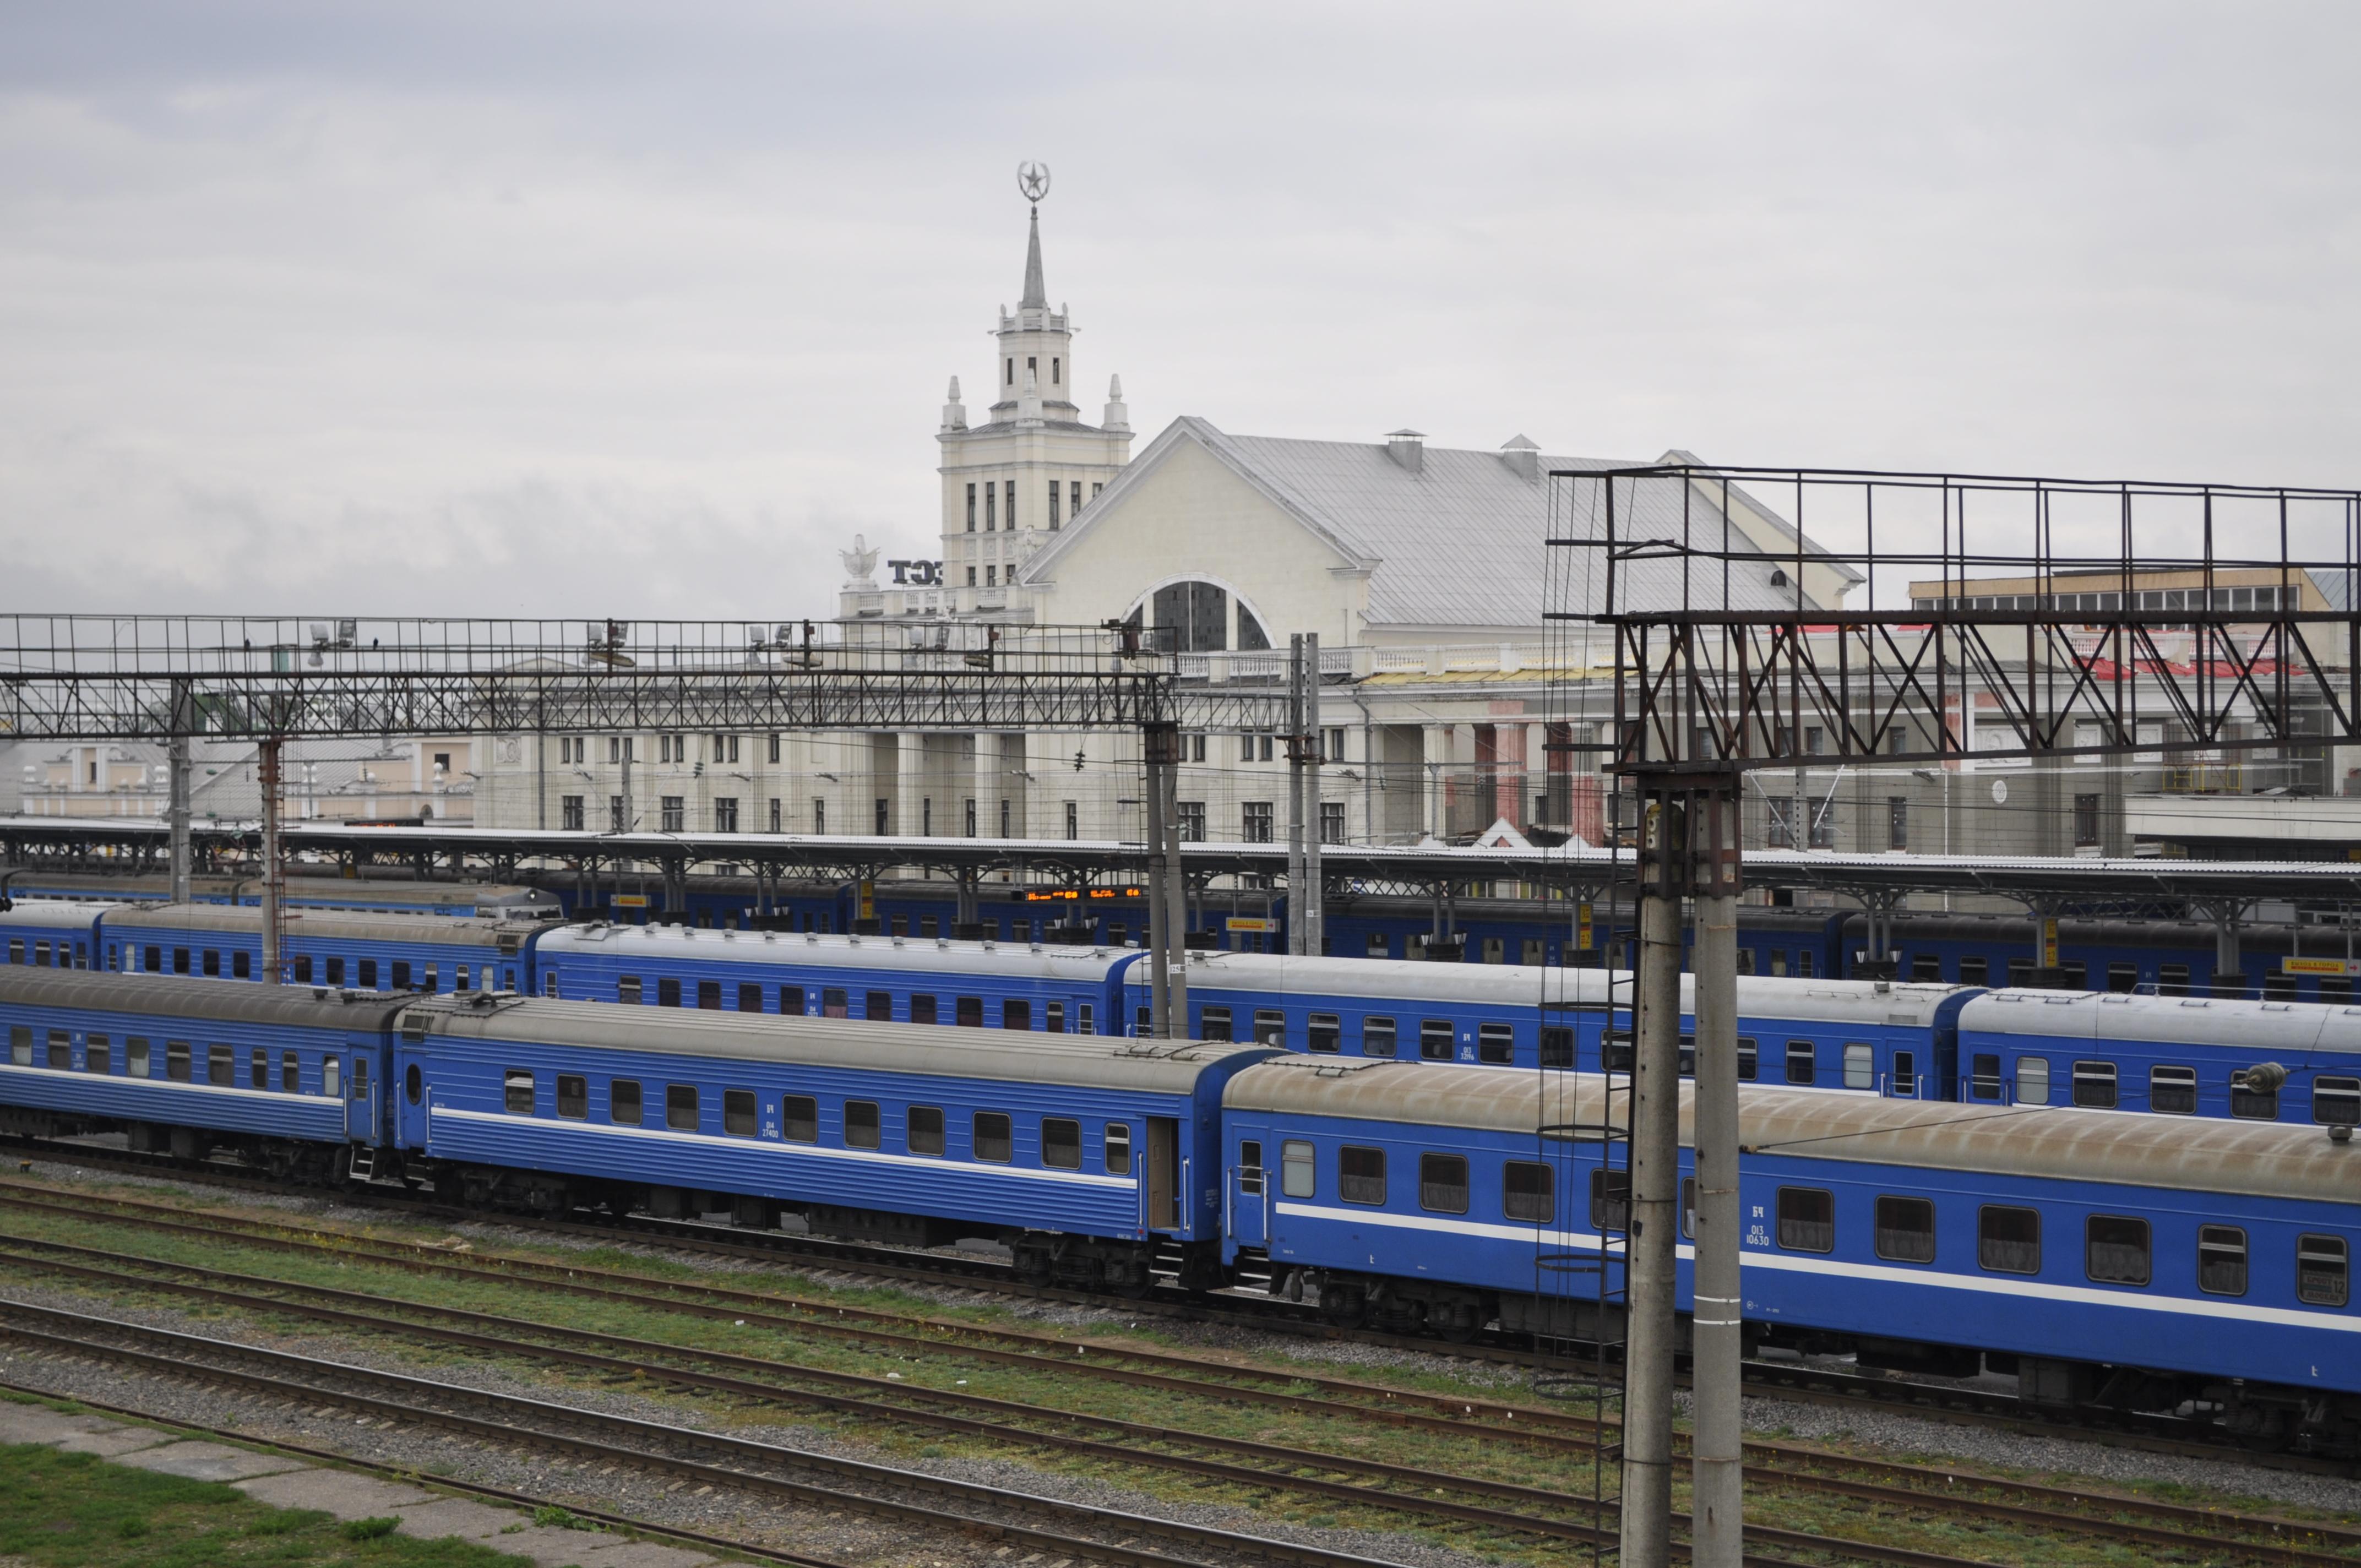 Railway station, Railway, Station, Tracks, Trains, HQ Photo